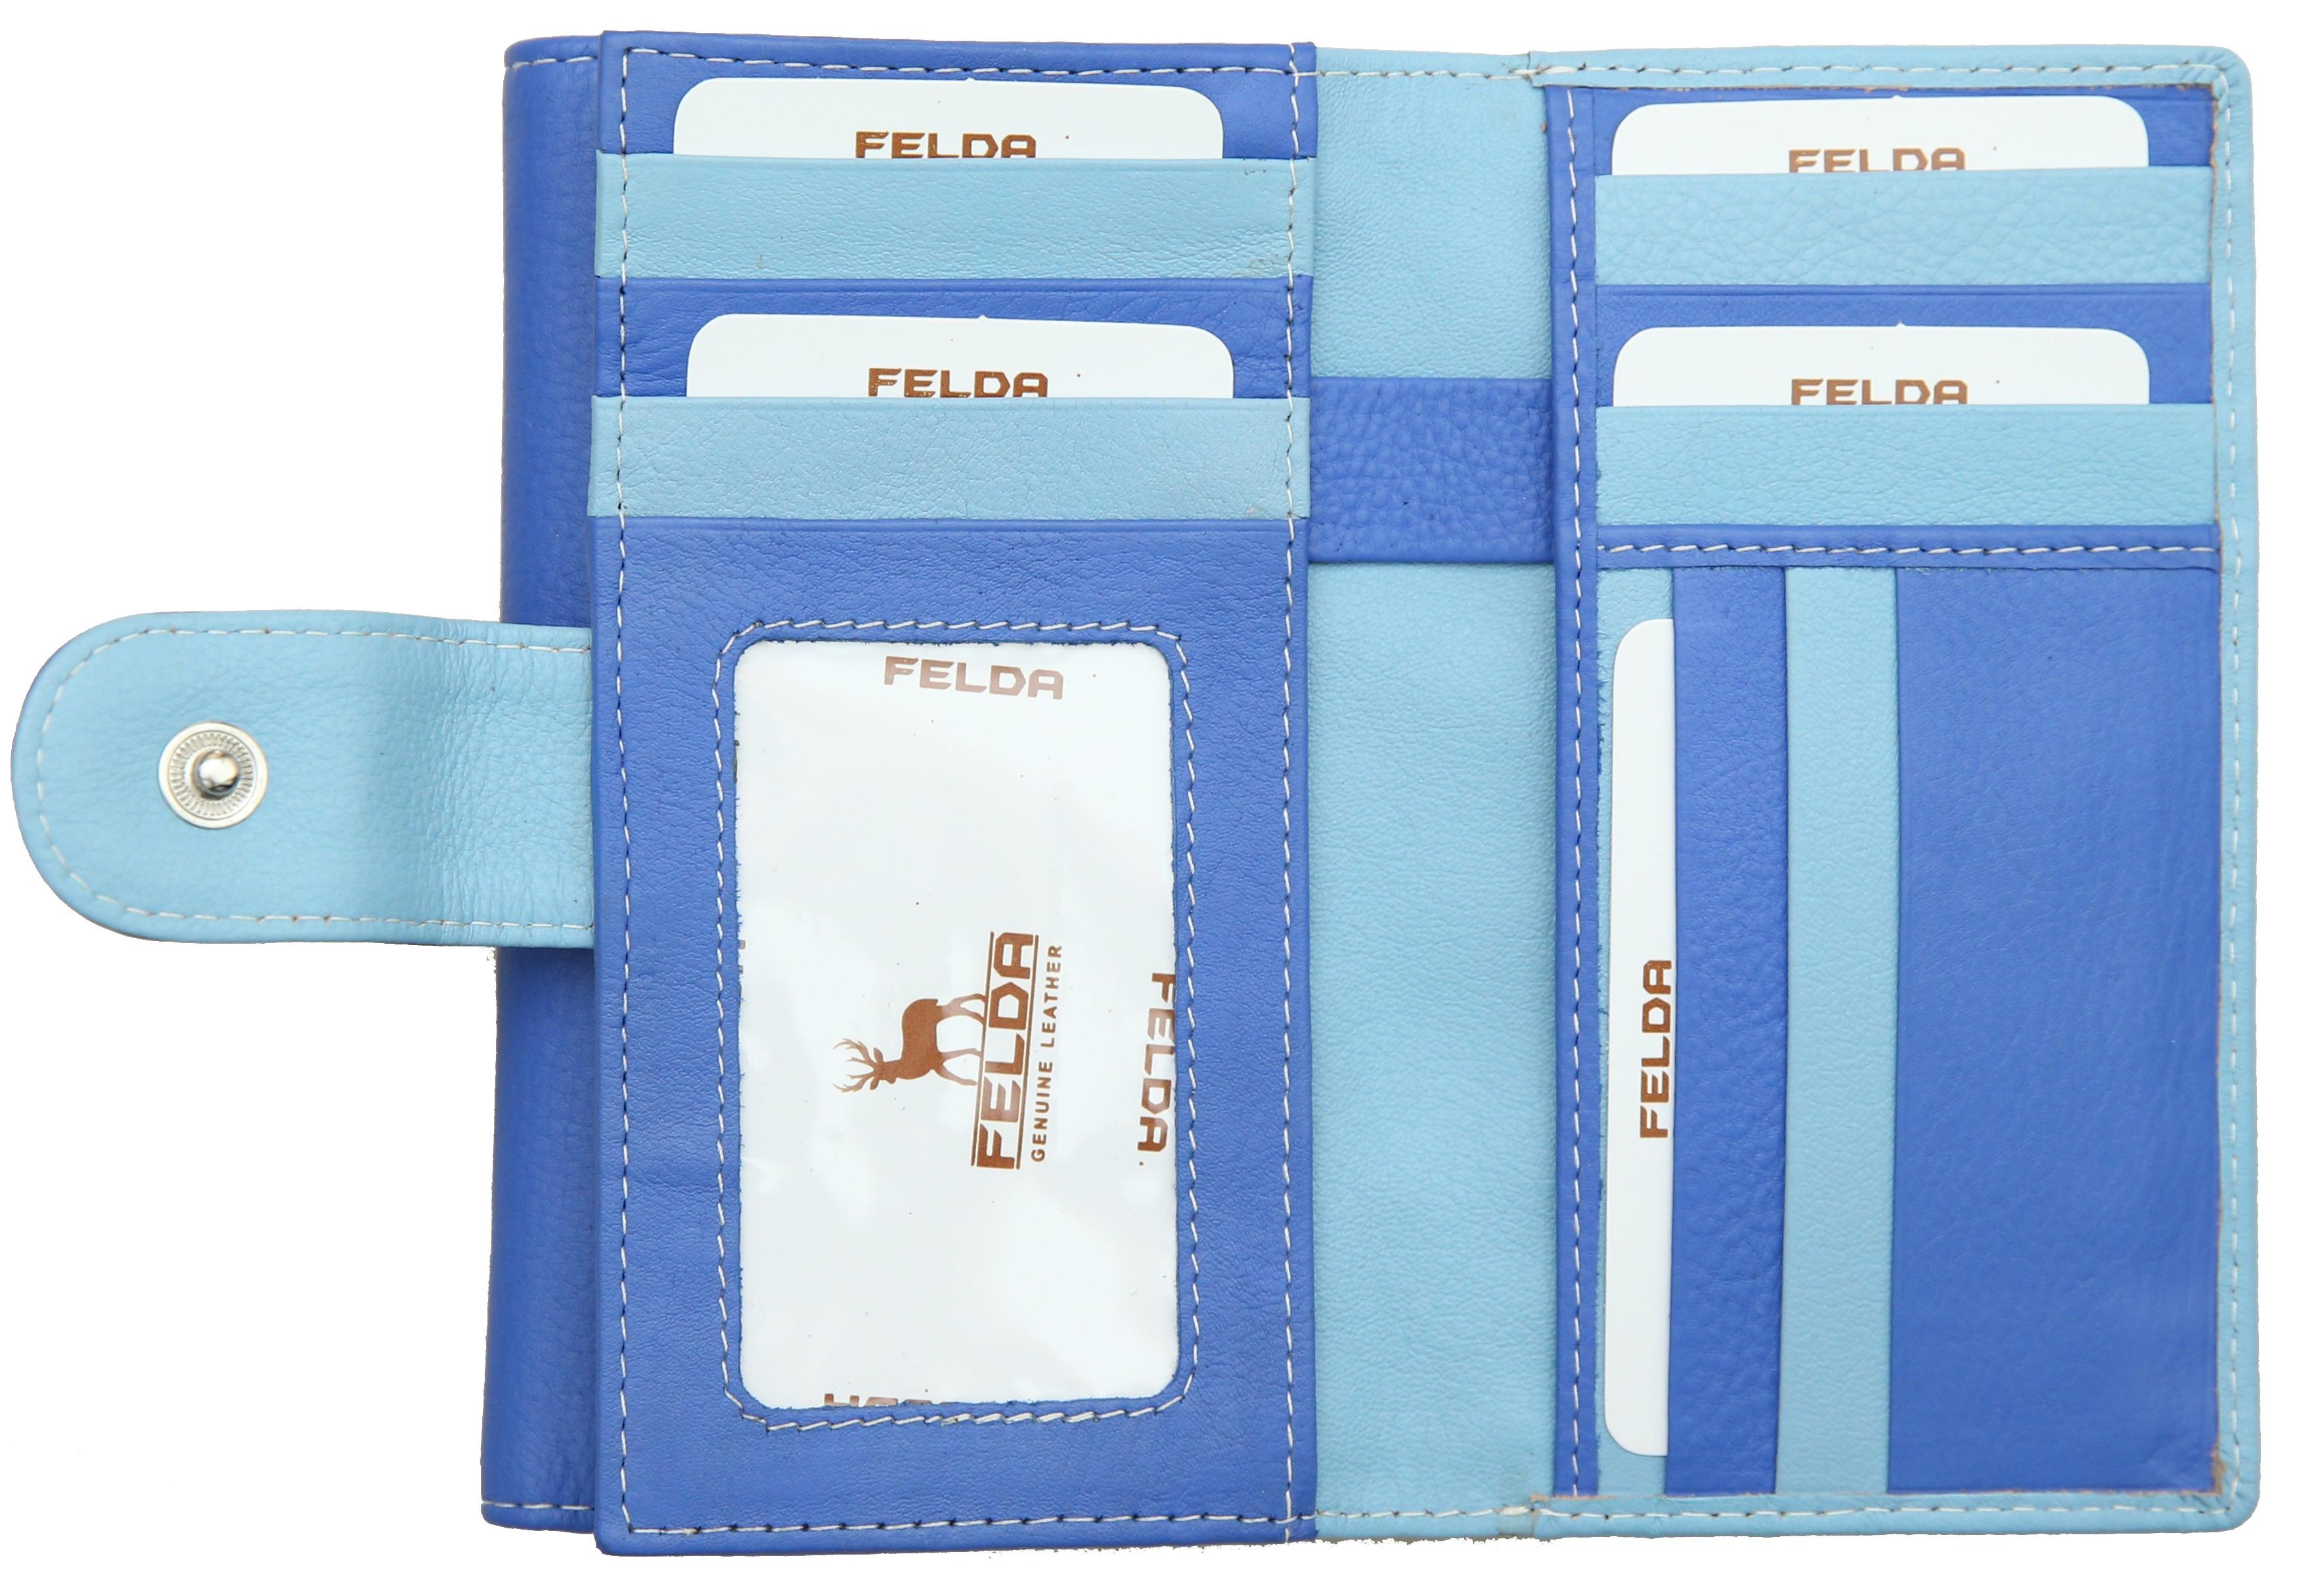 Felda-Portefeuille-pour-cartes-de-credit-cuir-souple-plusieurs-coloris miniature 15